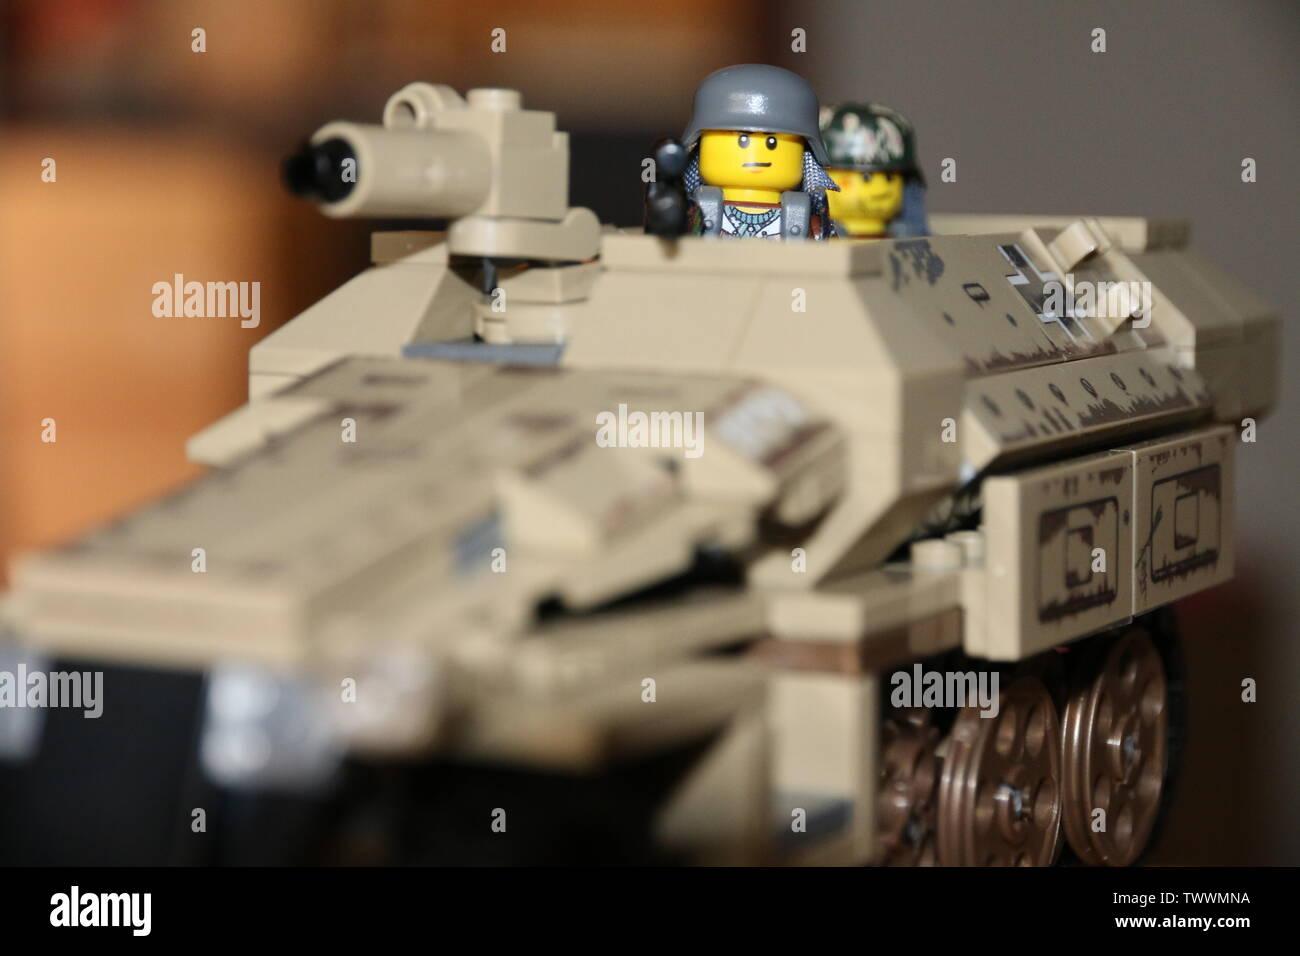 LEGO custom MOC WWII German soldier on a Sd.Kfz 251 halftrack. - Stock Image